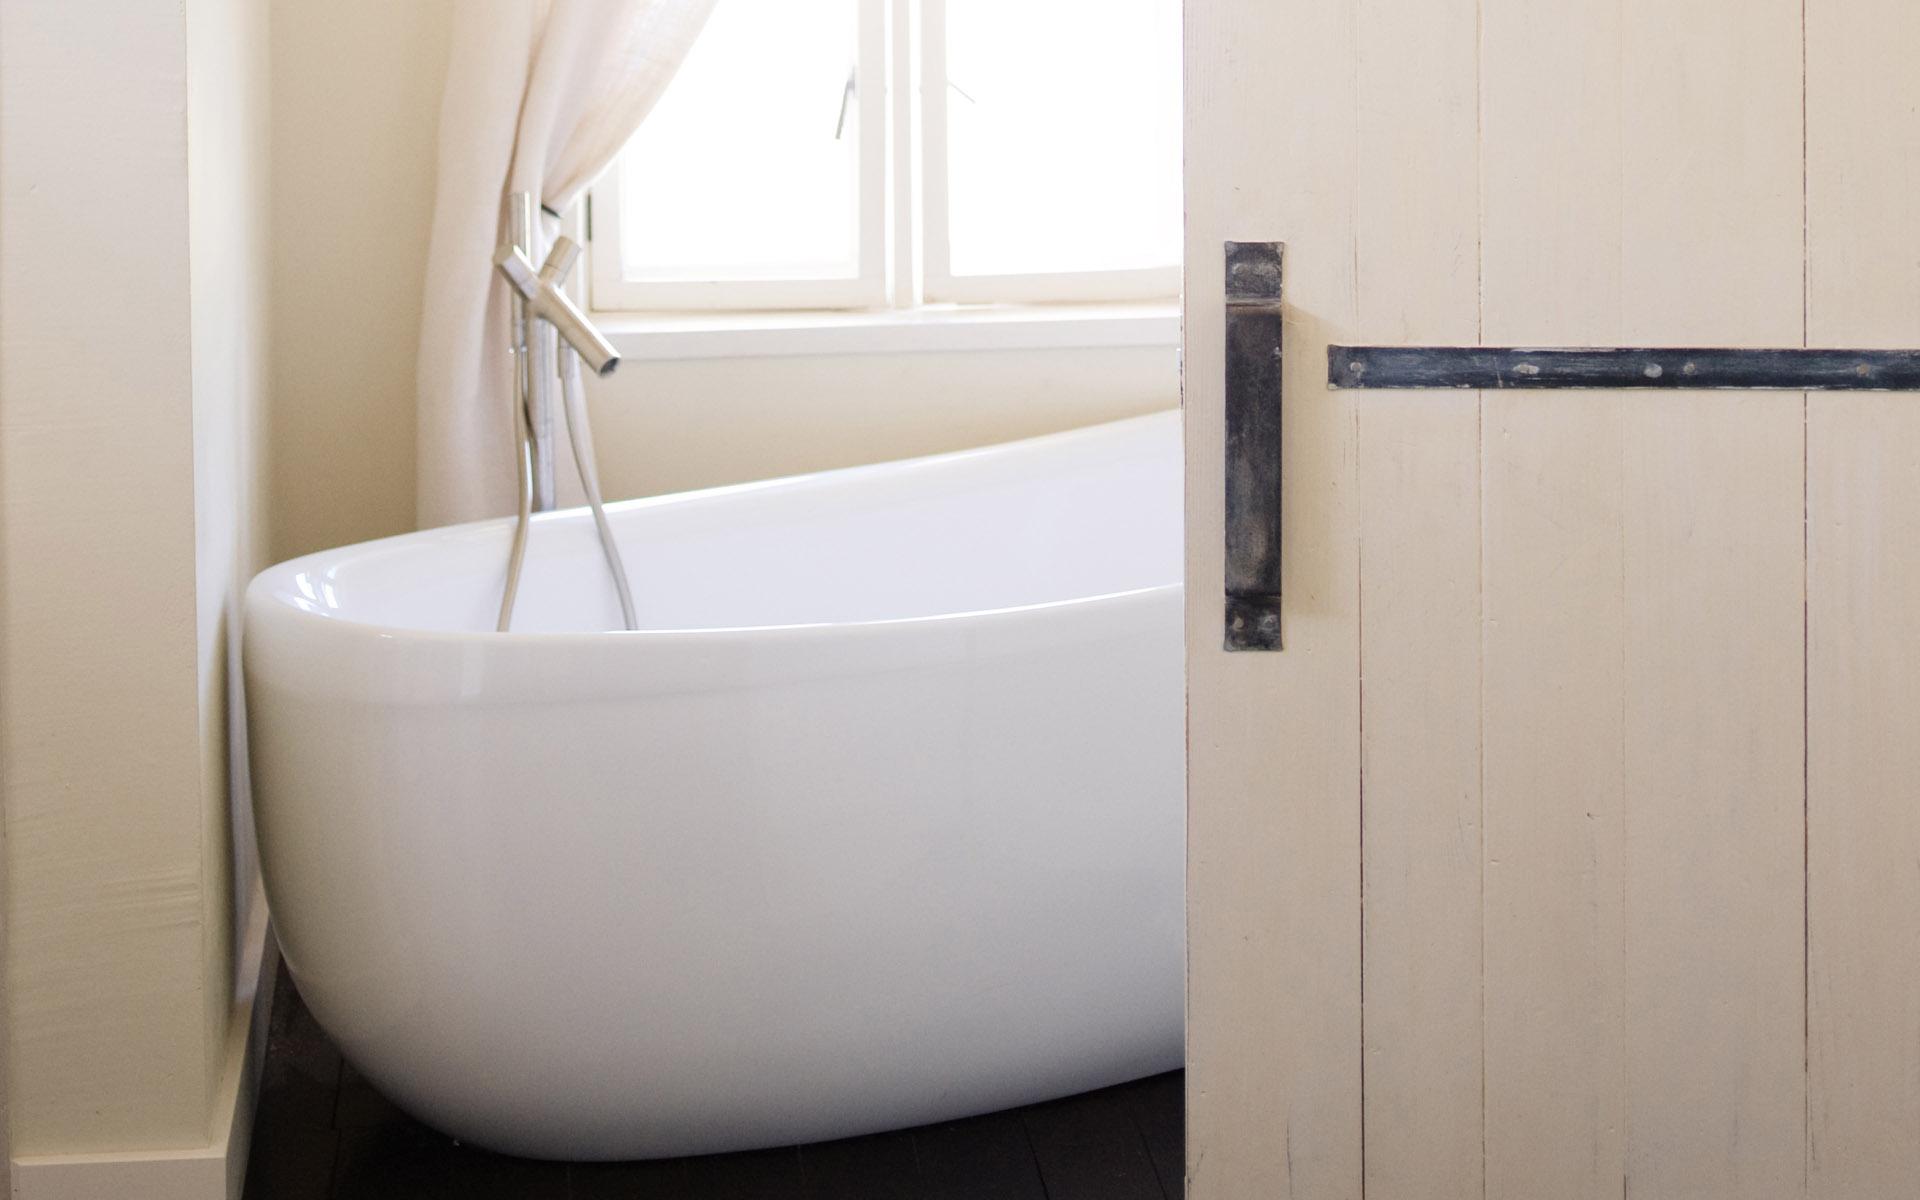 Bathroom-Bathtub-Closeup Bathroom Bathtub Closeup